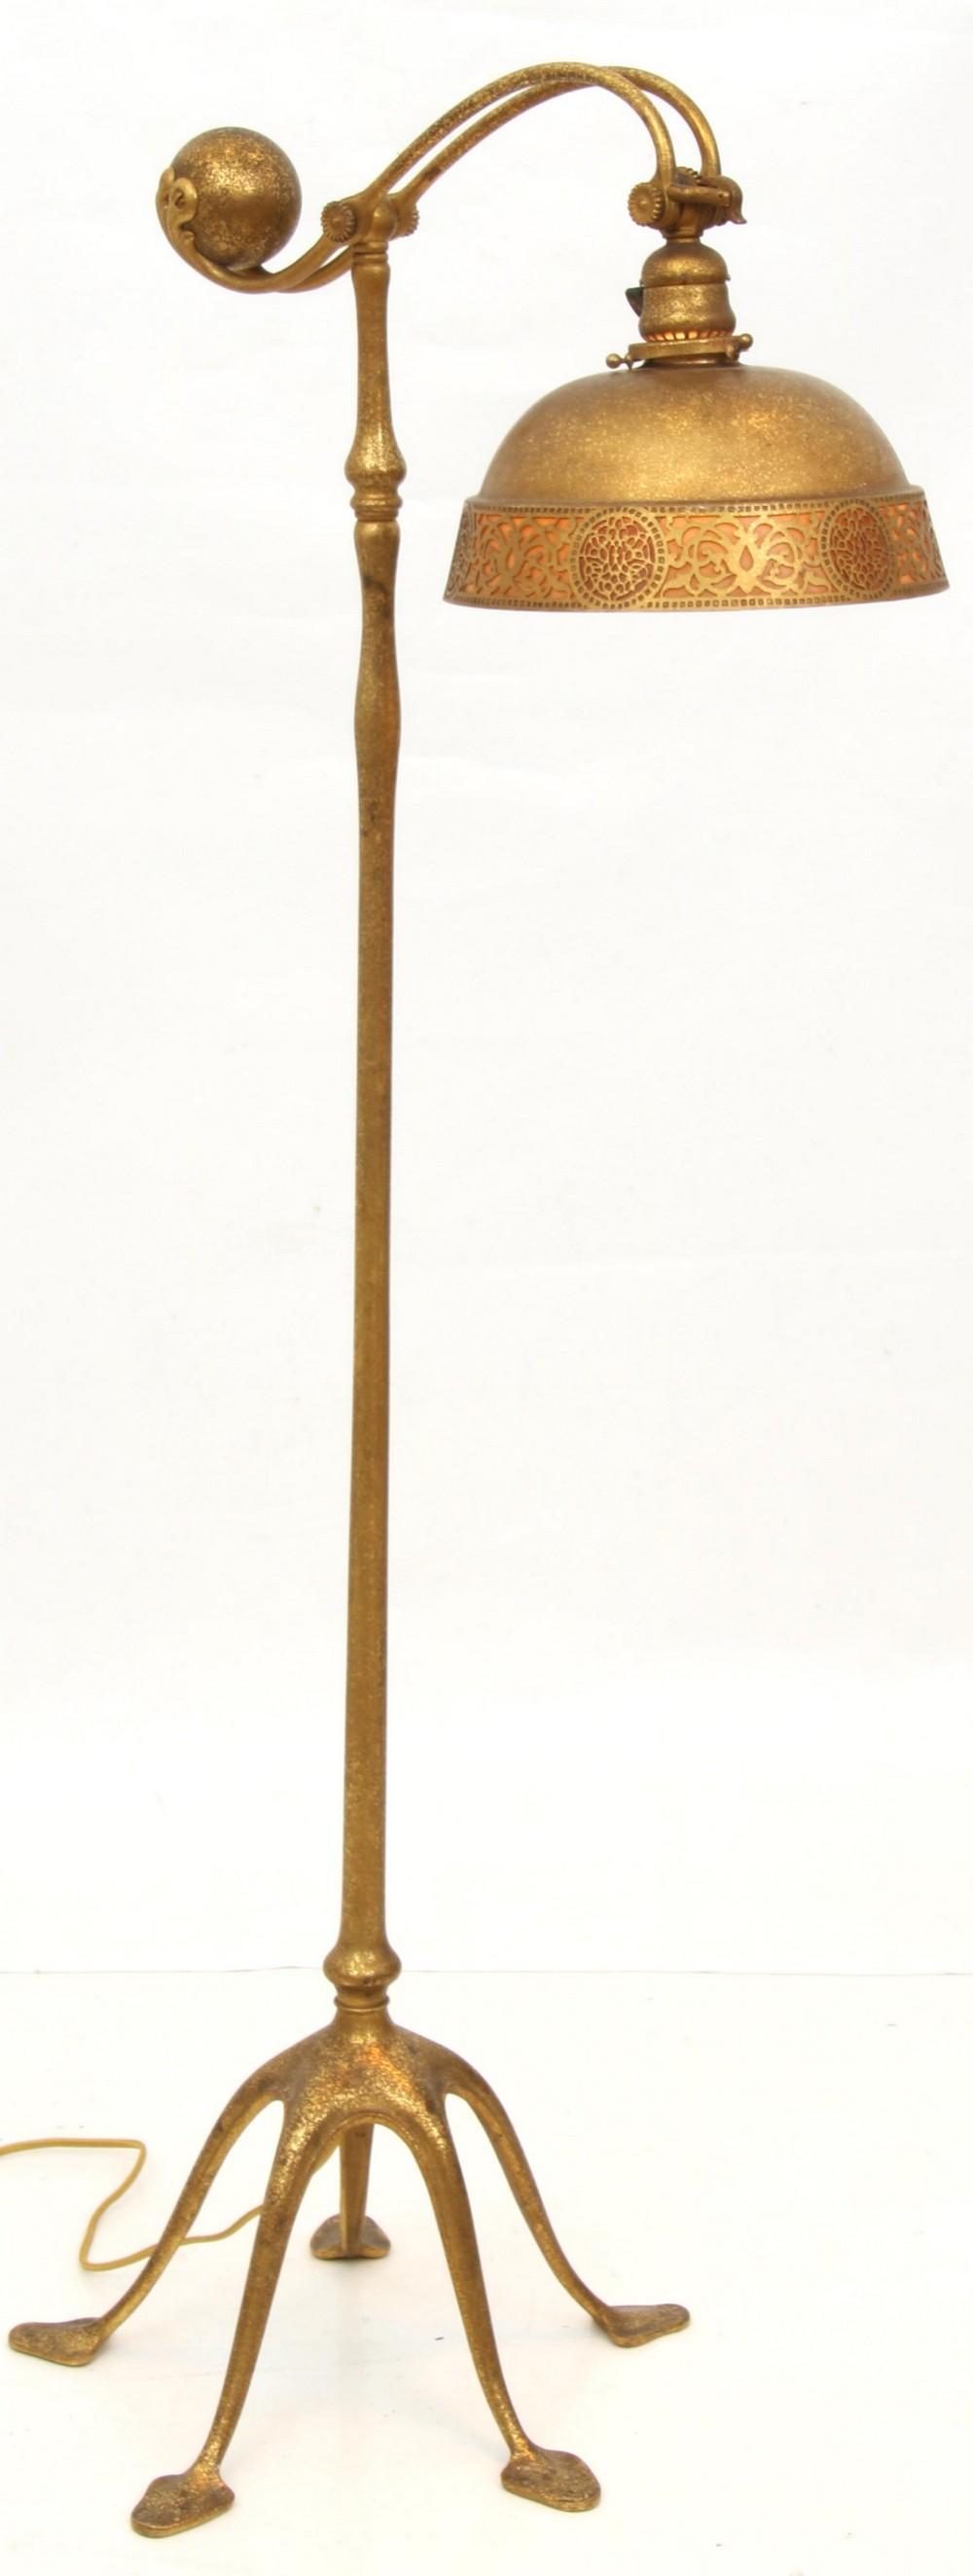 Tiffany Studios Counterbalance Floor Lamp